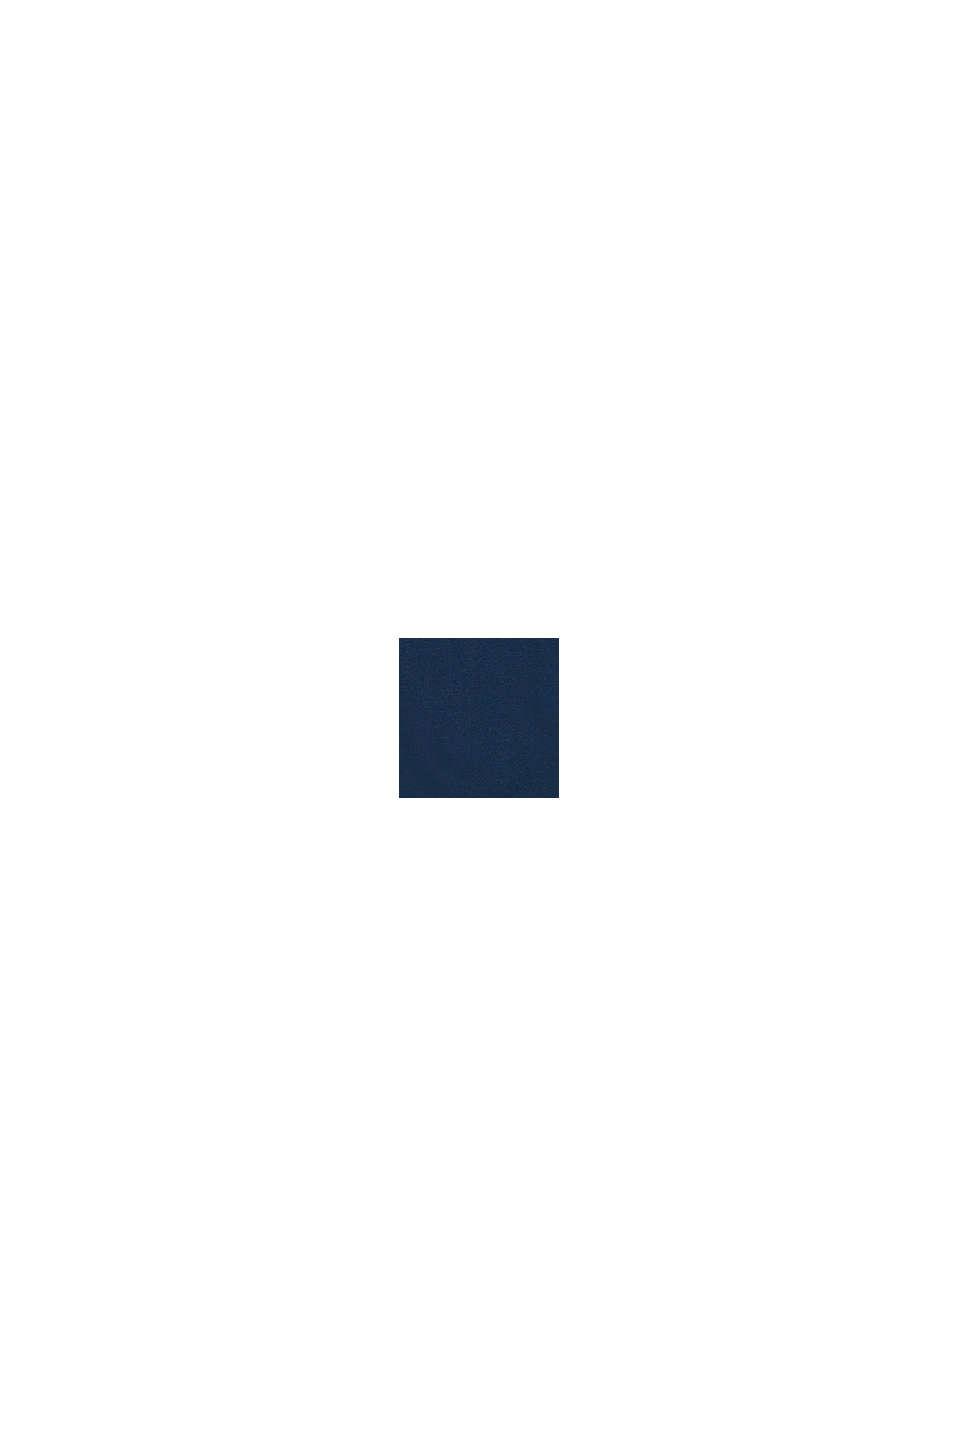 T-shirt di cotone con stampa, PETROL BLUE, swatch